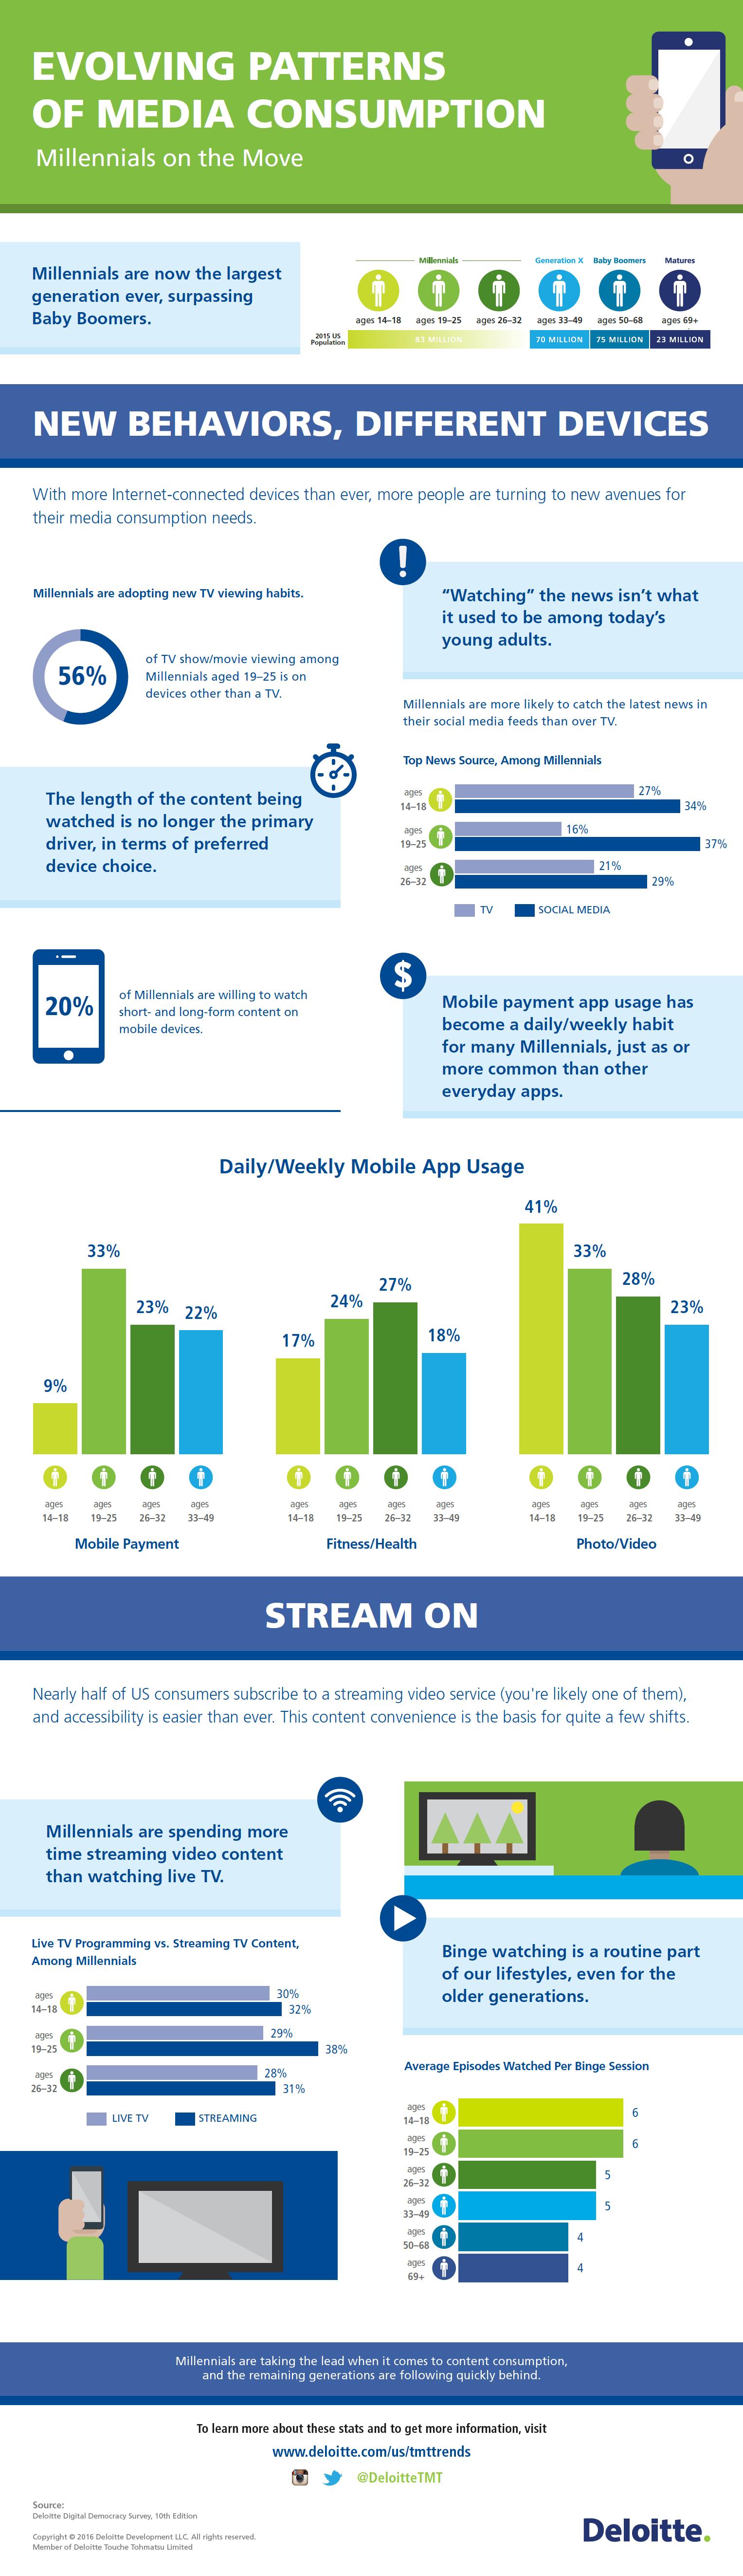 Deloitte Digital Democracy Infographic